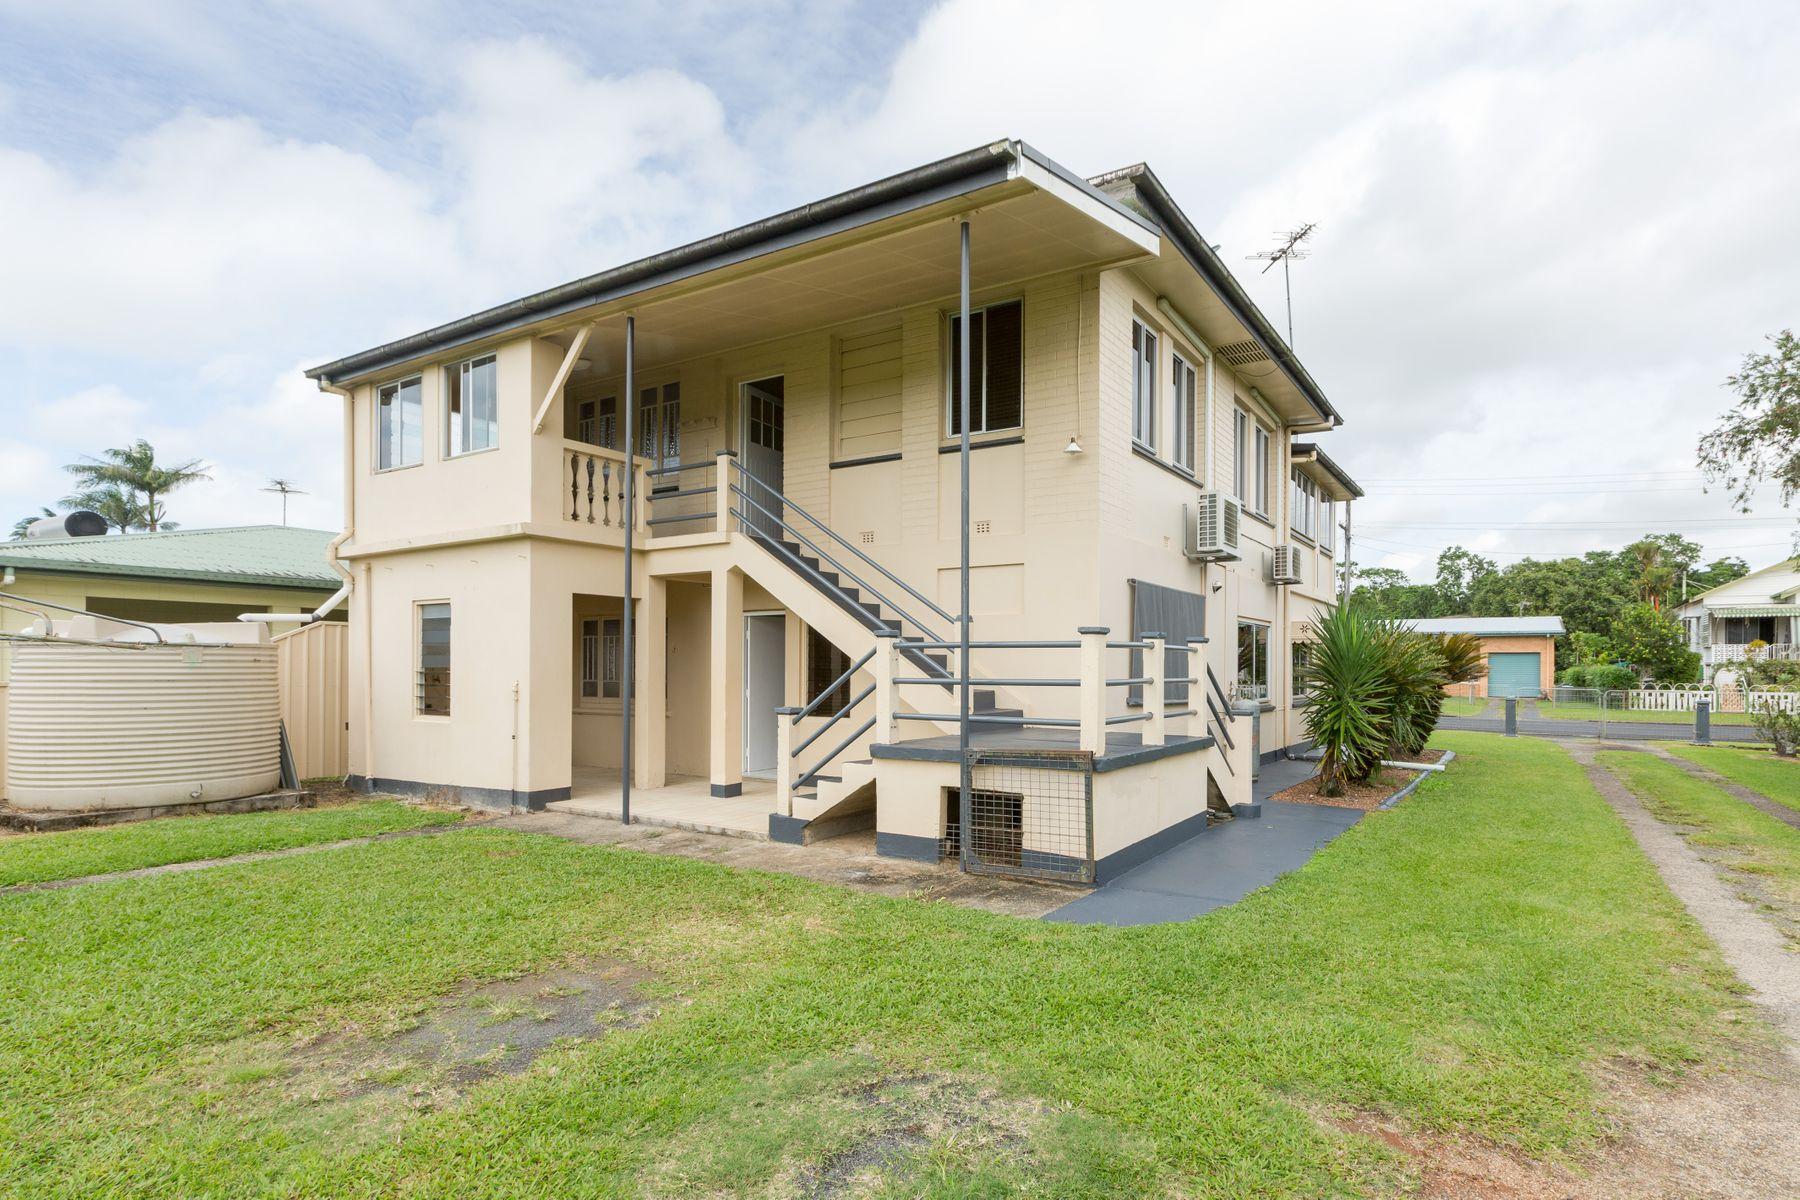 47 Campbell Street, Cullinane, QLD 4860